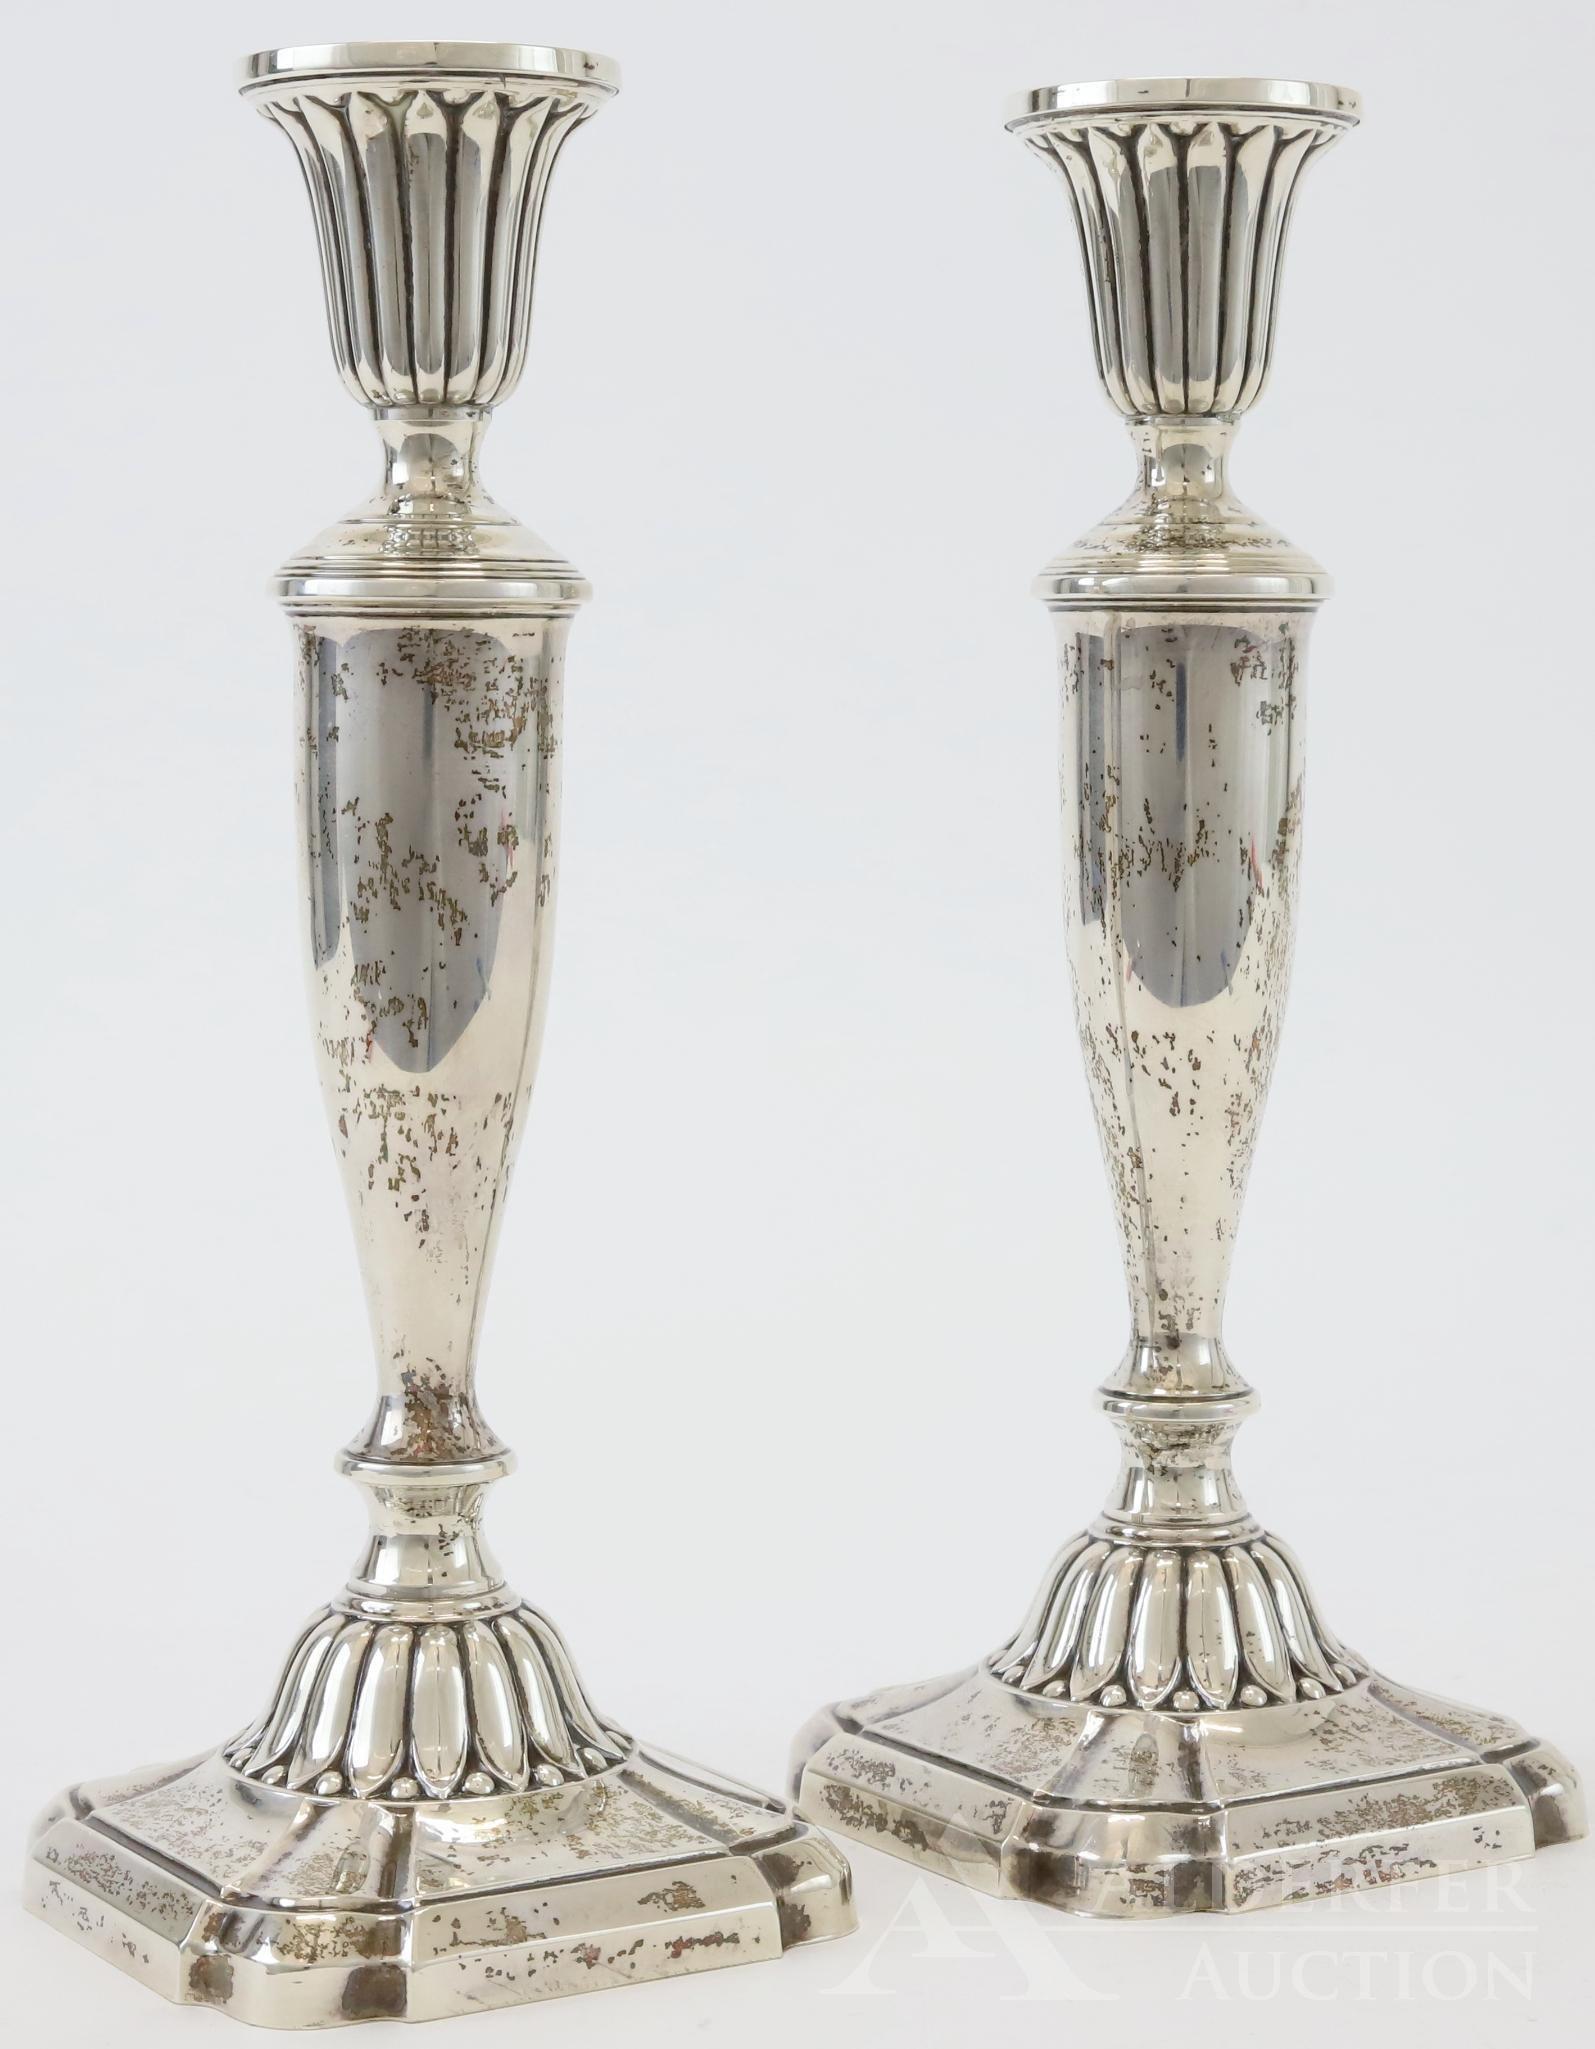 Sterling Silver Candlesticks